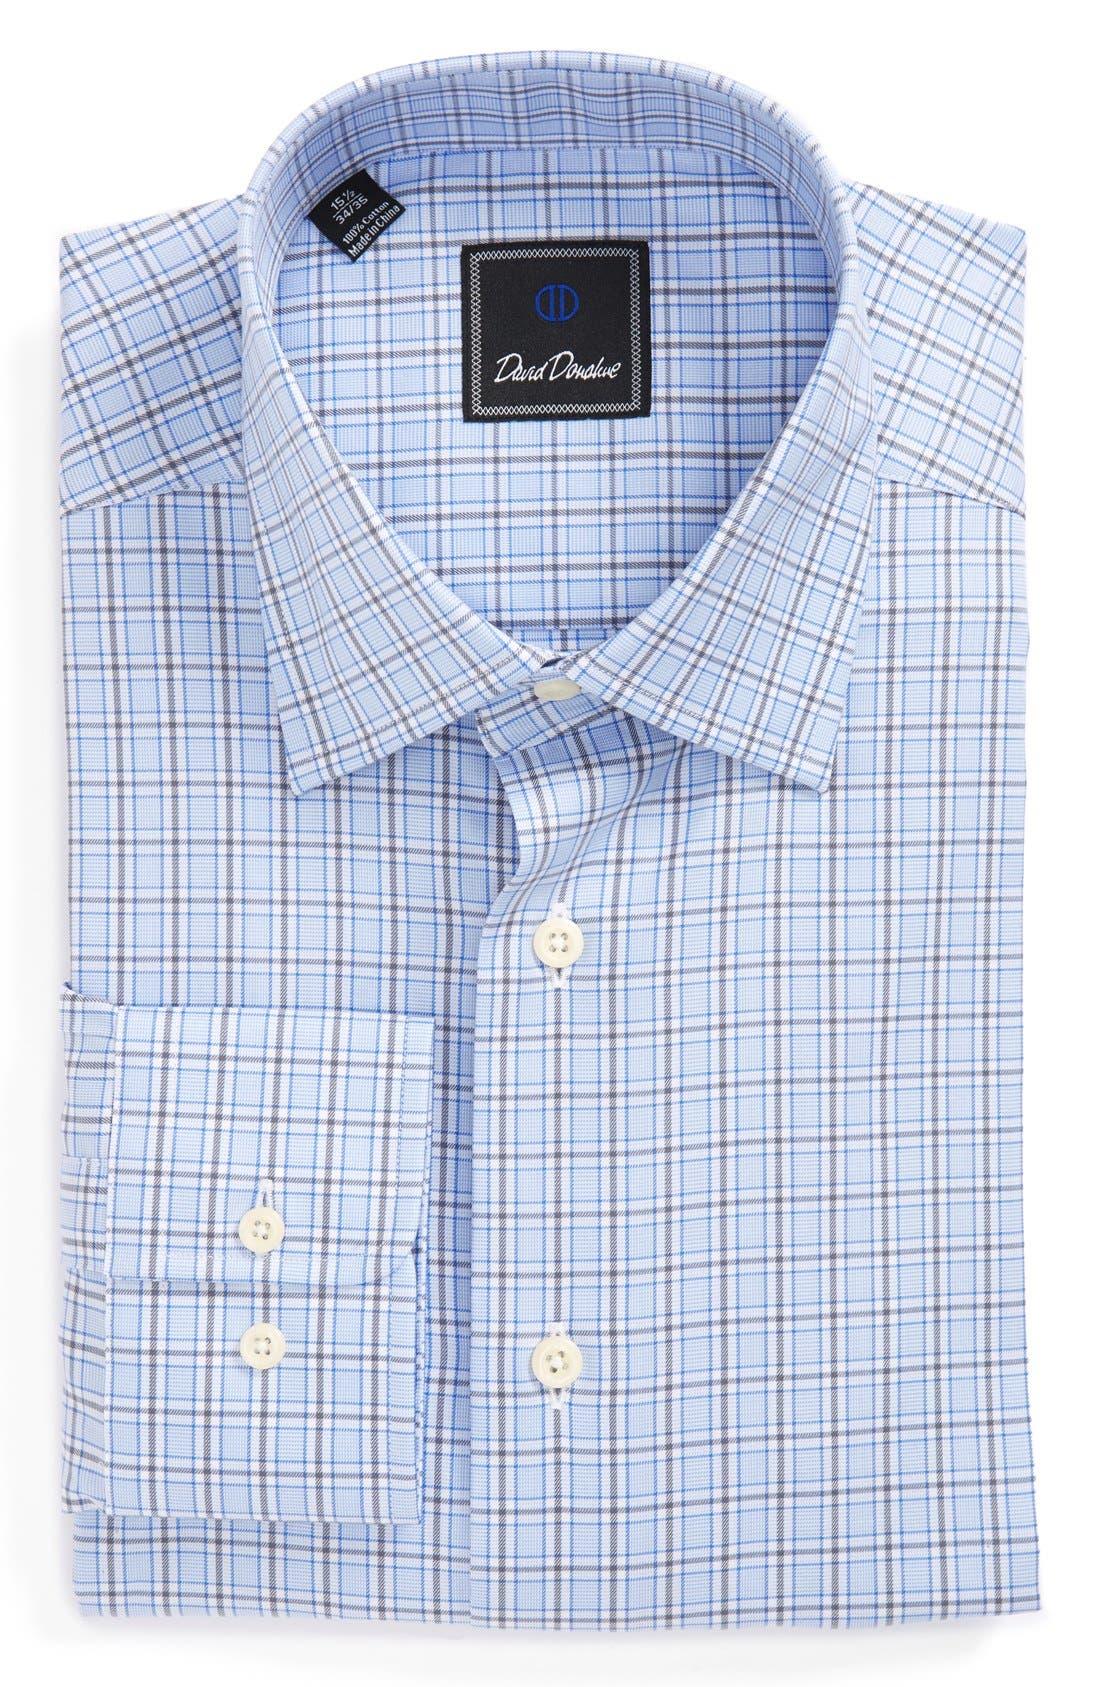 Regular Fit Plaid Dress Shirt,                         Main,                         color, 489